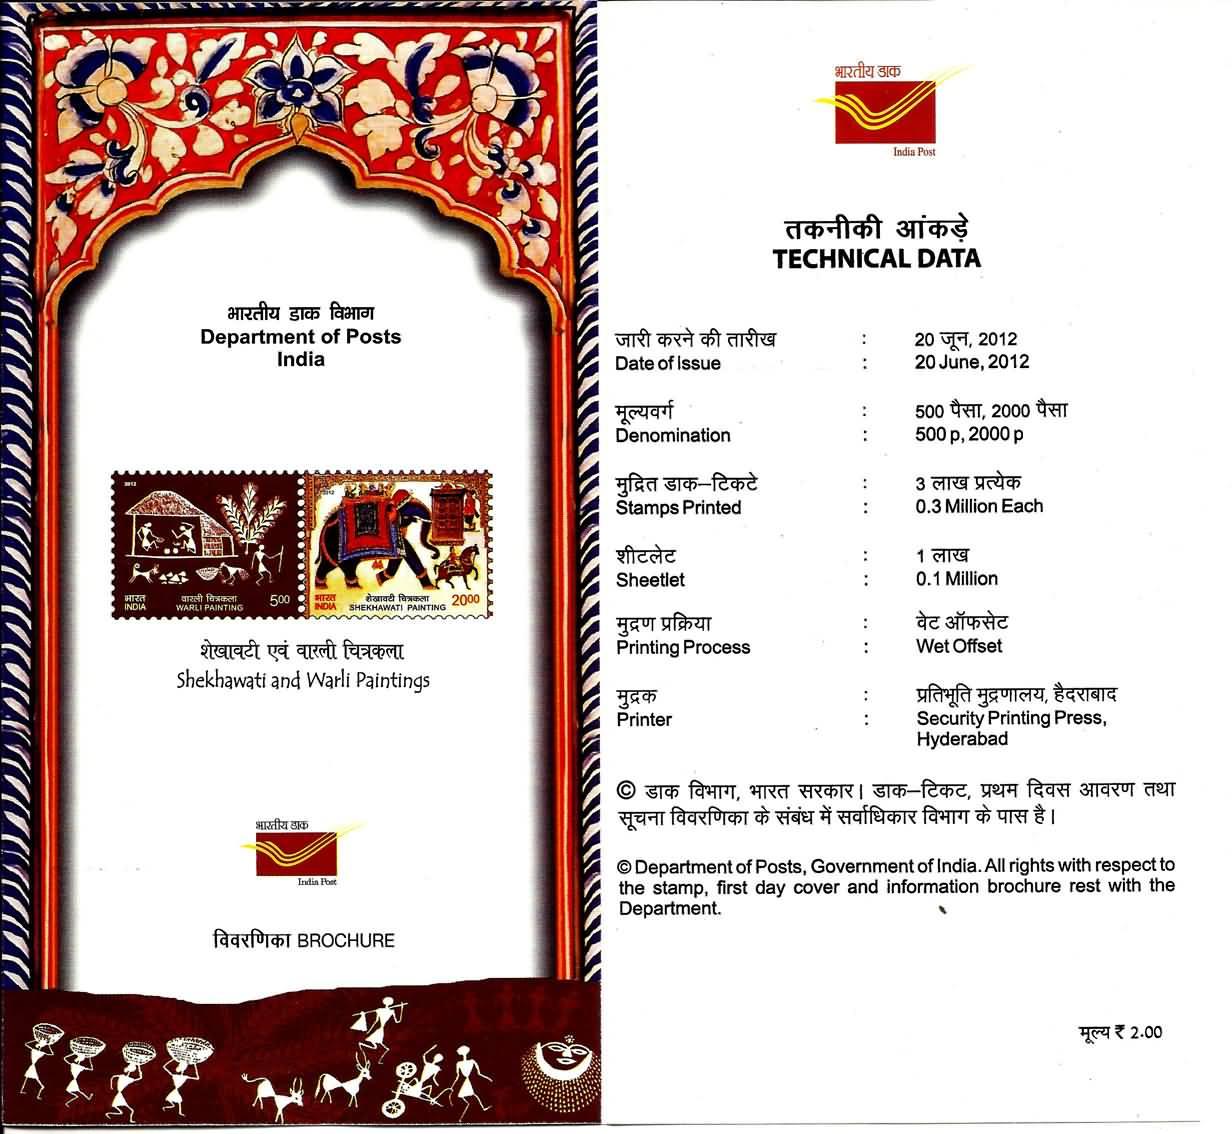 http://www.stampsofindia.com/lists/brochures/2012brochure2298-99.jpg